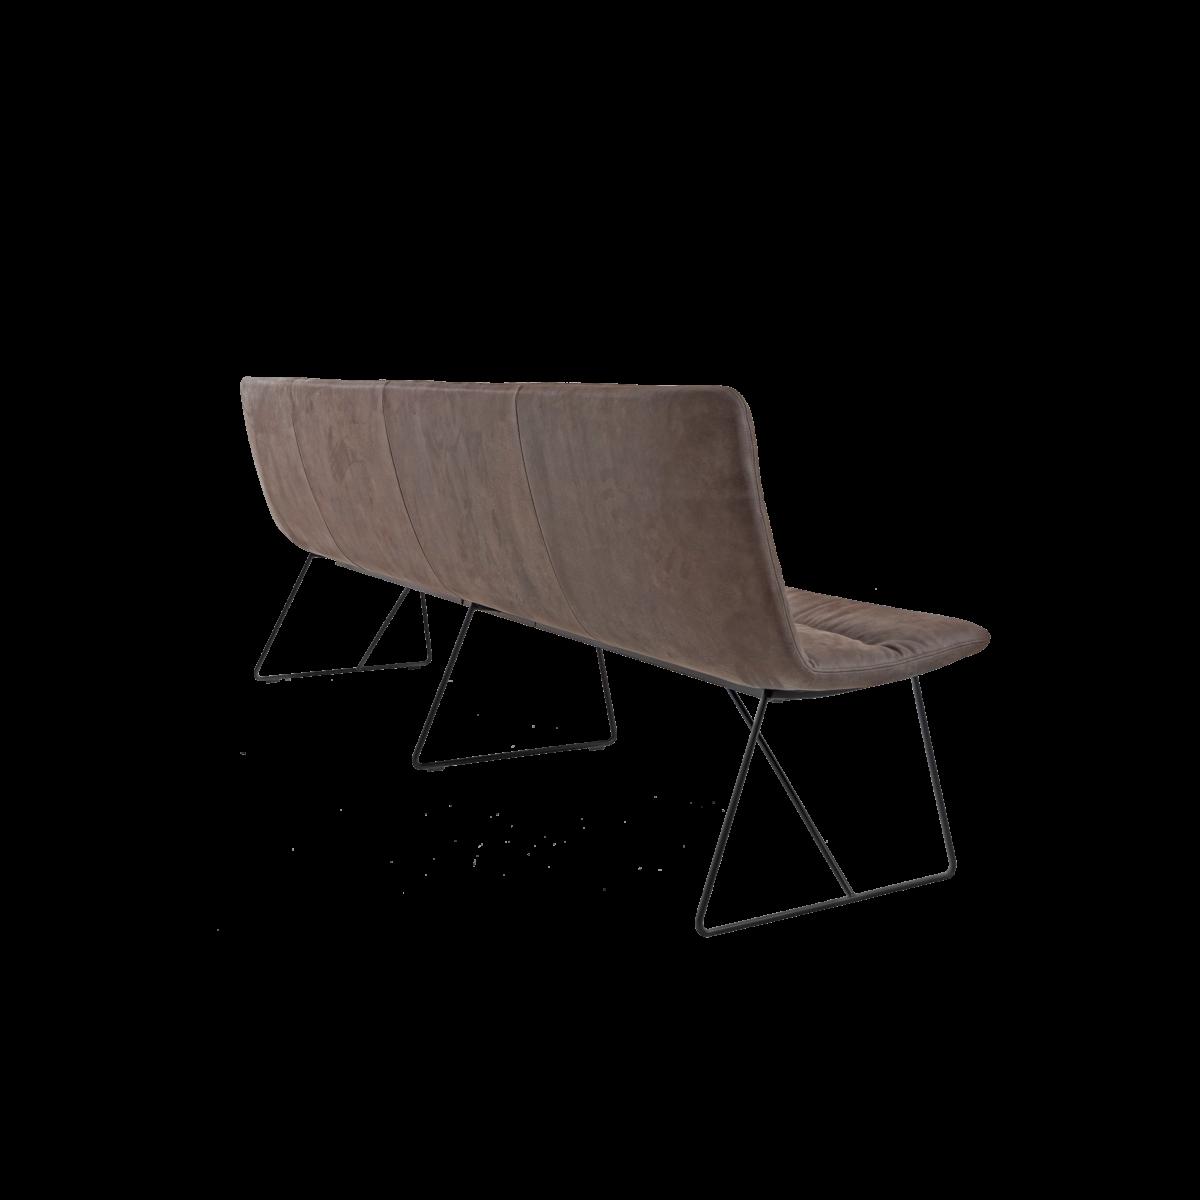 ARVA LIGHT BENCH 4er bench kuf oA pol brown KFF  4 1200x1200 - Bancheta Arva Light KFF